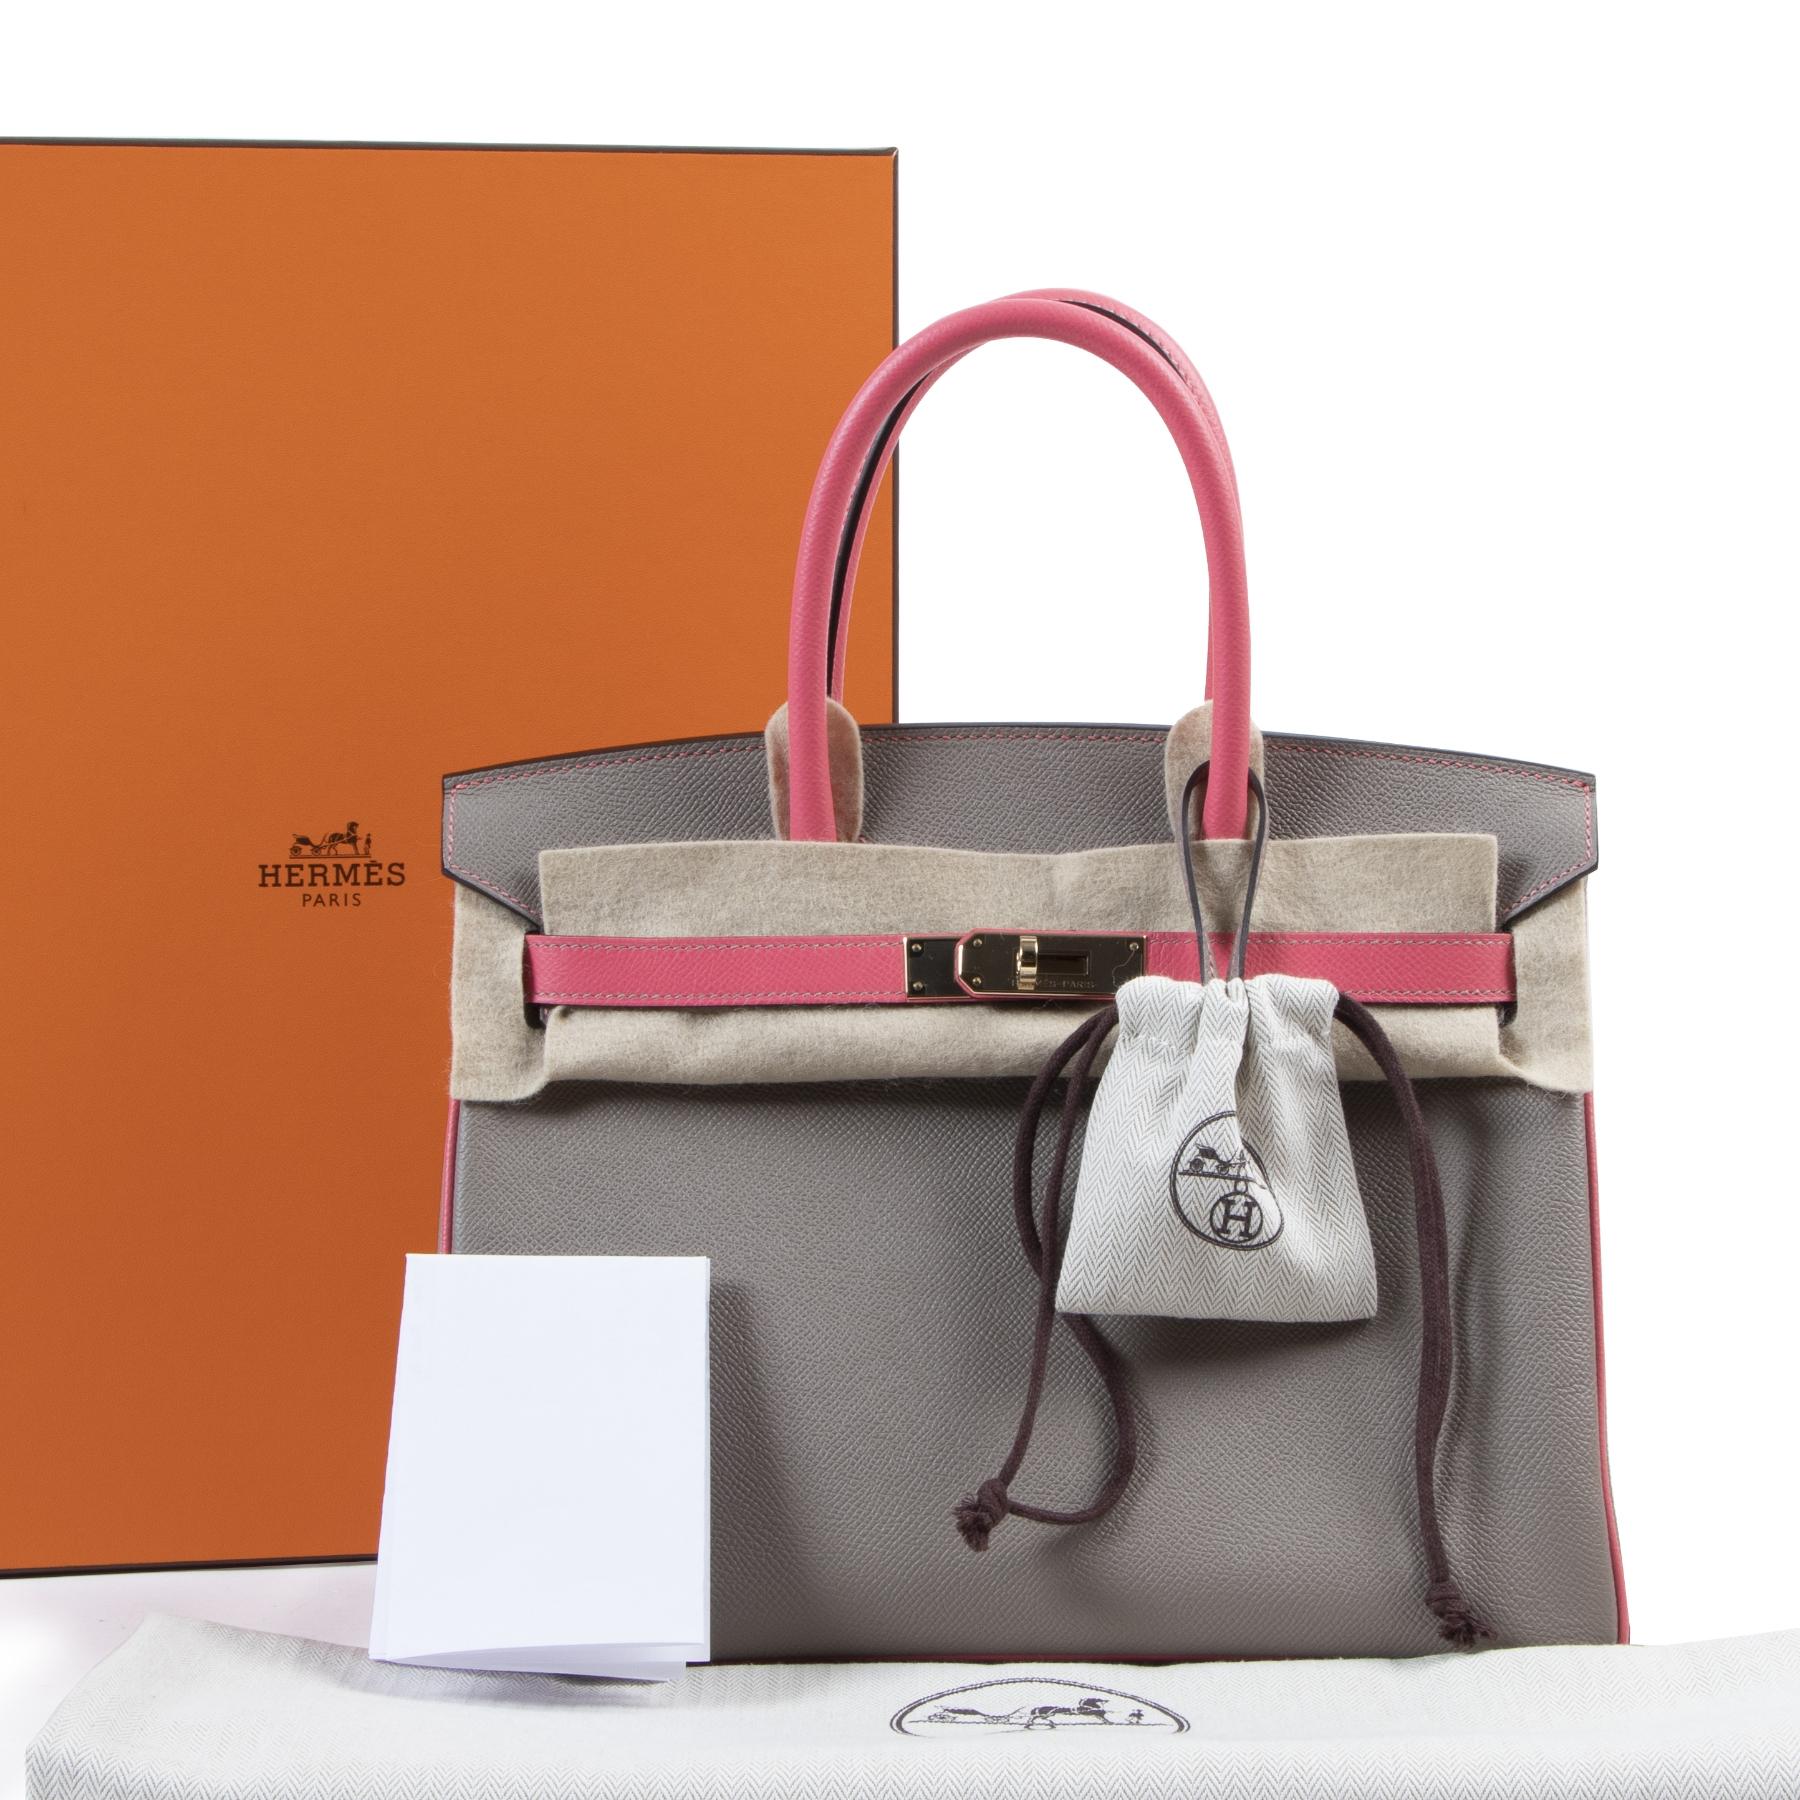 2020 most wanted designer handbag HSS *Special order* Hermès Birkin 30 Epsom Gris Asphalt / Rose Azalee online at Labellov